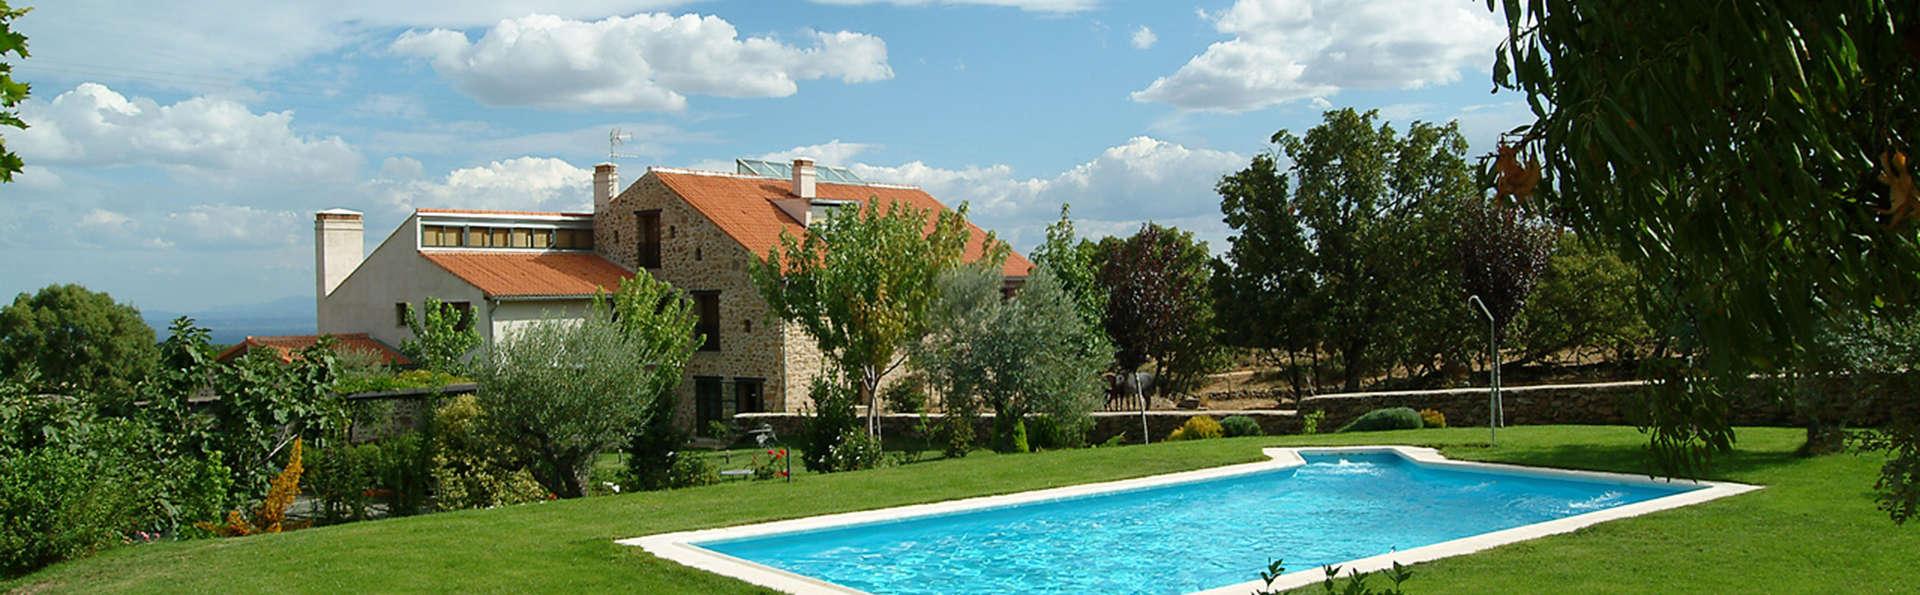 Hotel El Turcal - EDIT_pool.jpg